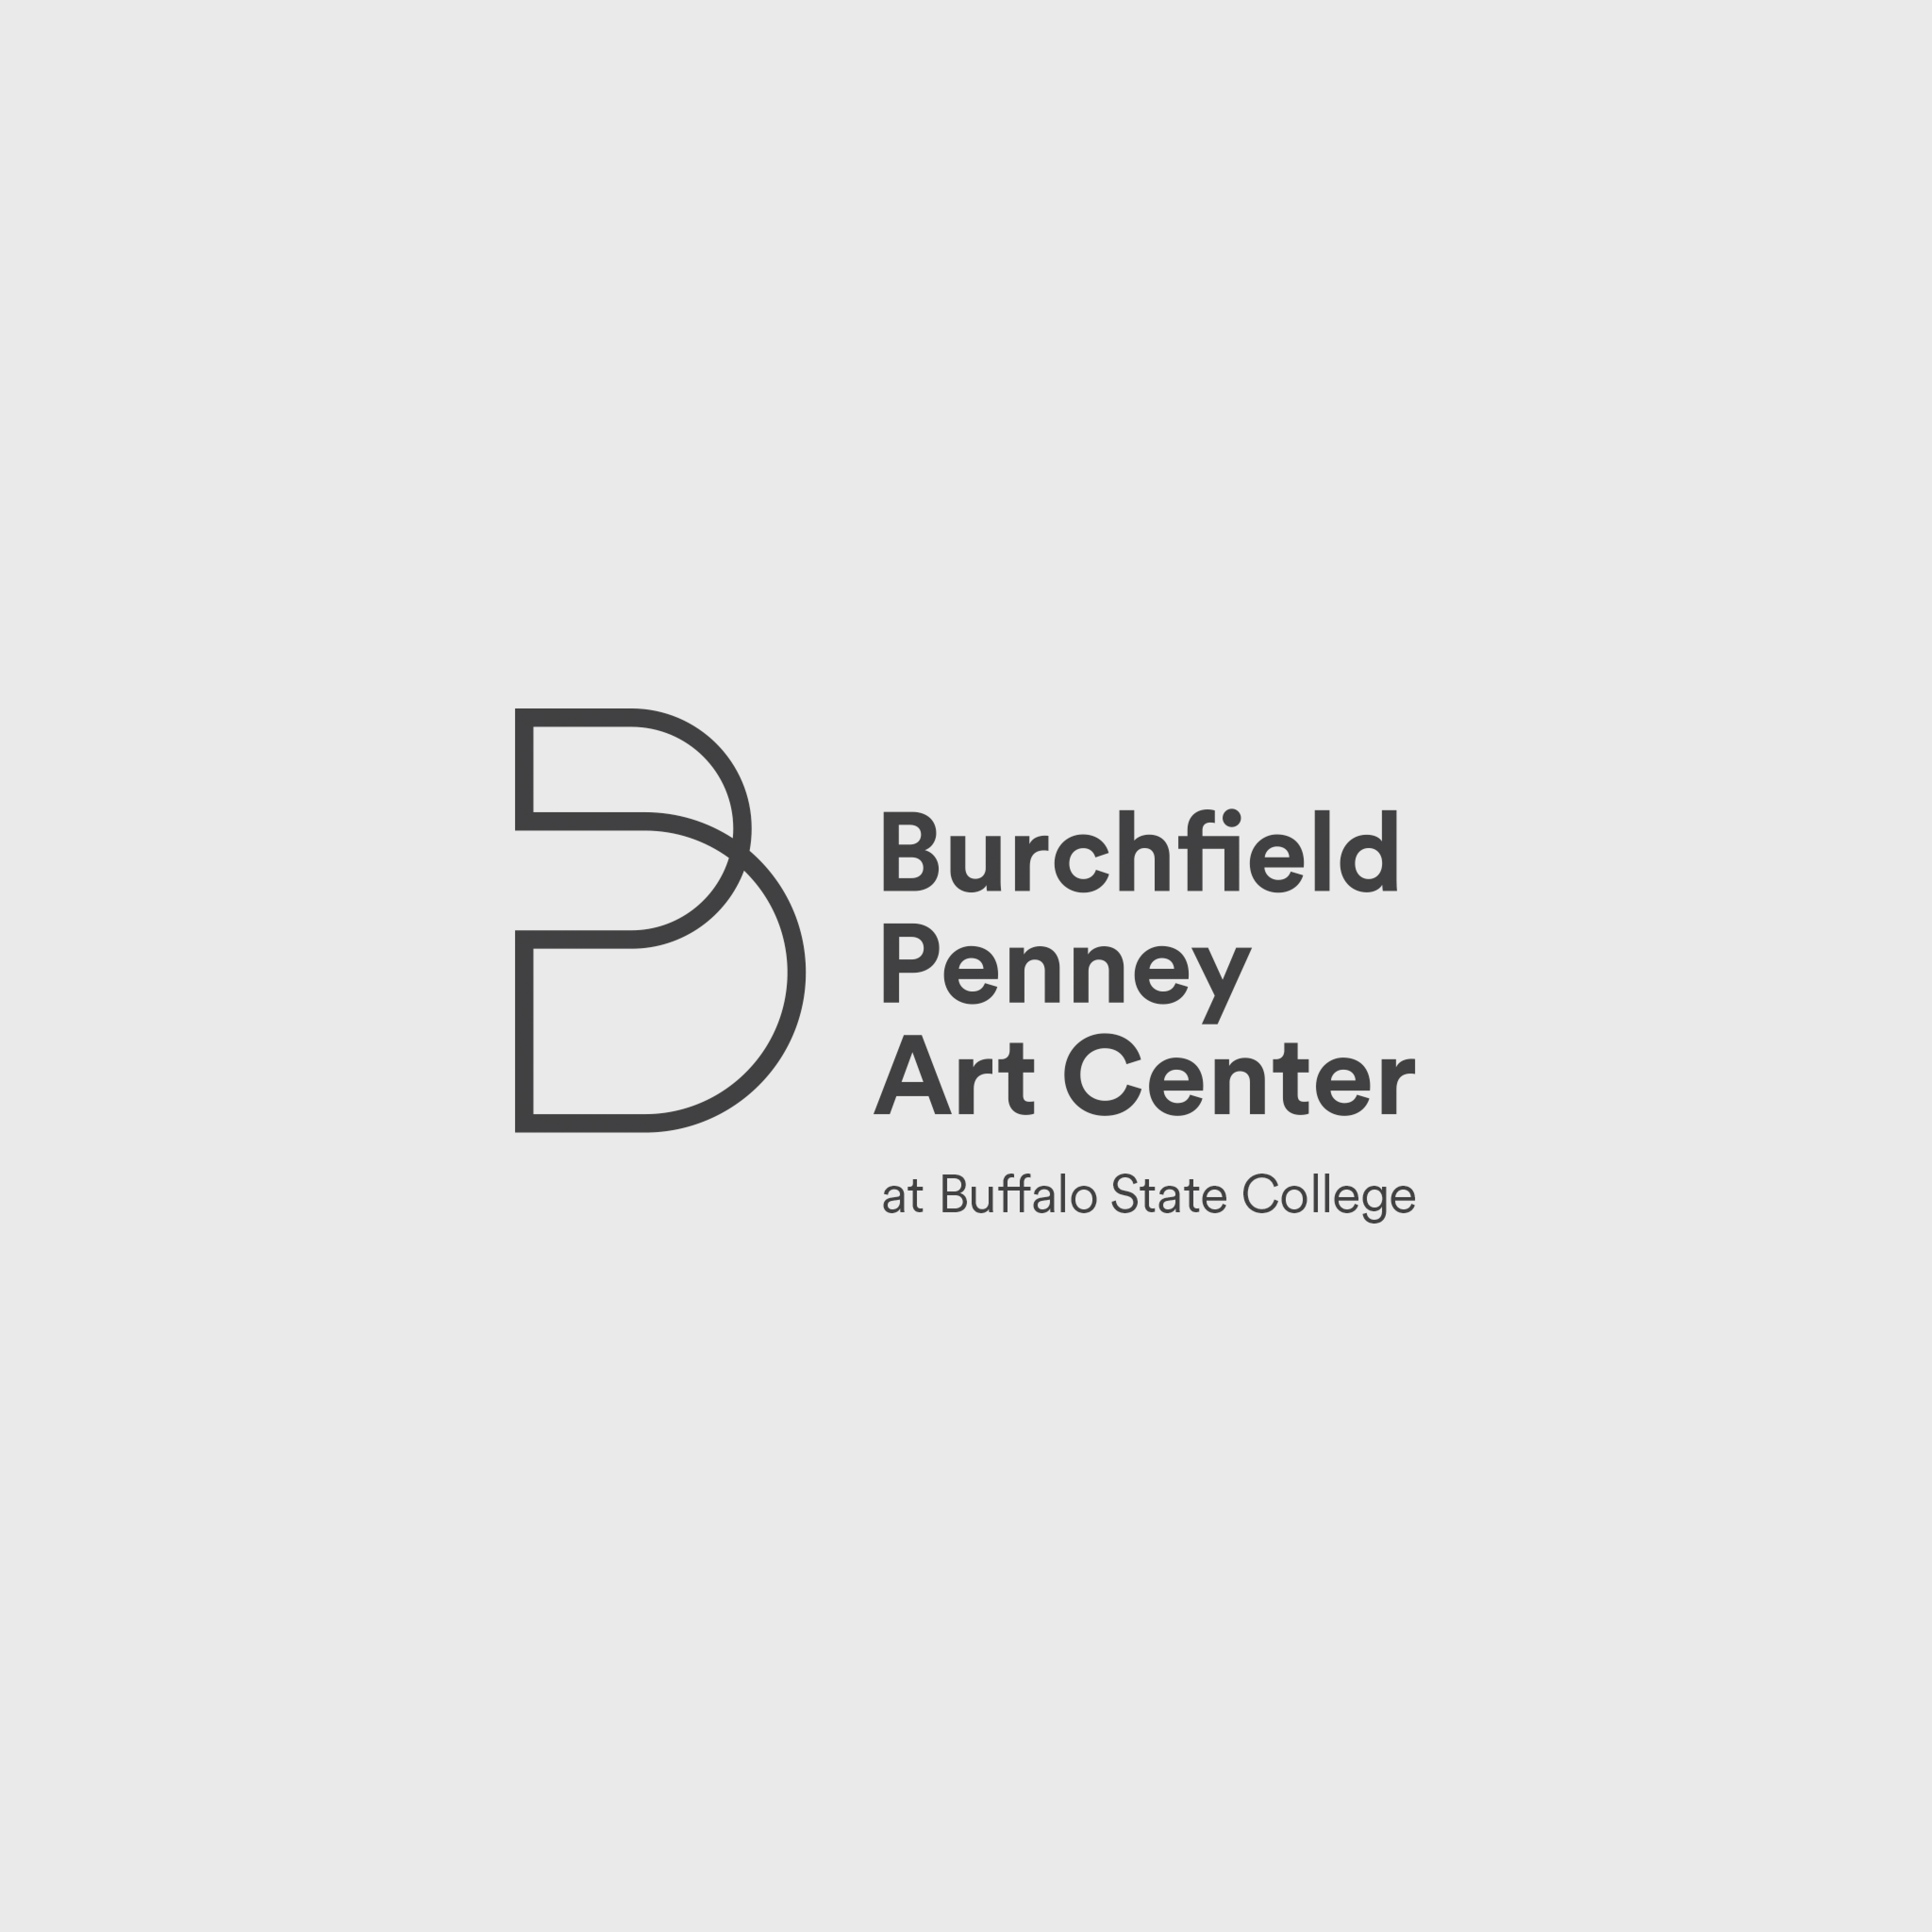 Charles E Burchfield Mid June Gt Exhibitions Gt Burchfield